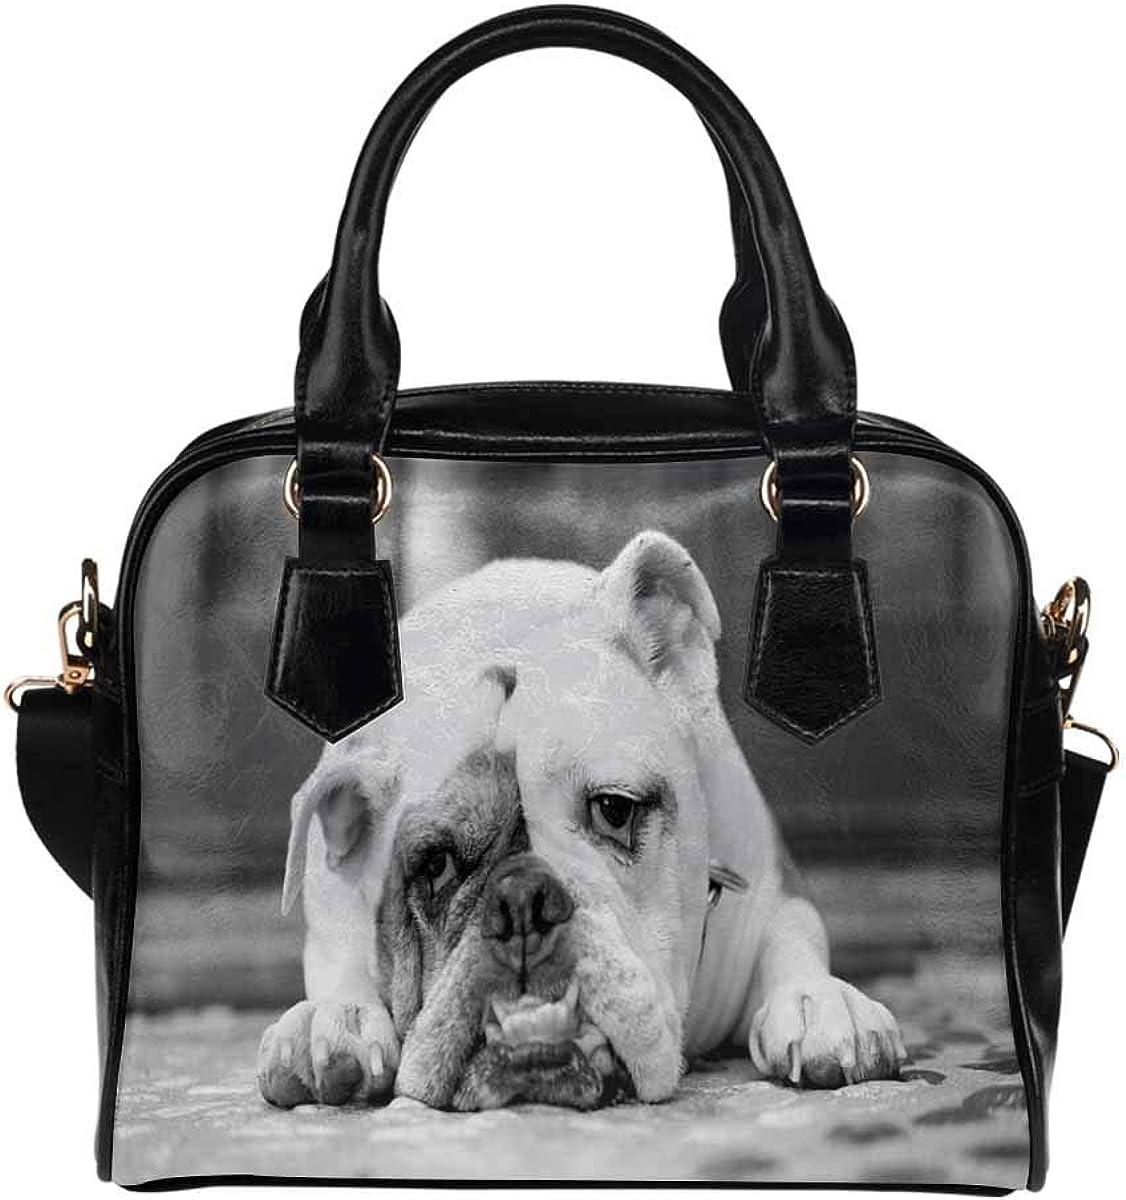 InterestPrint Women's Casual Bag Shoulder Bag PU Leather Handbags